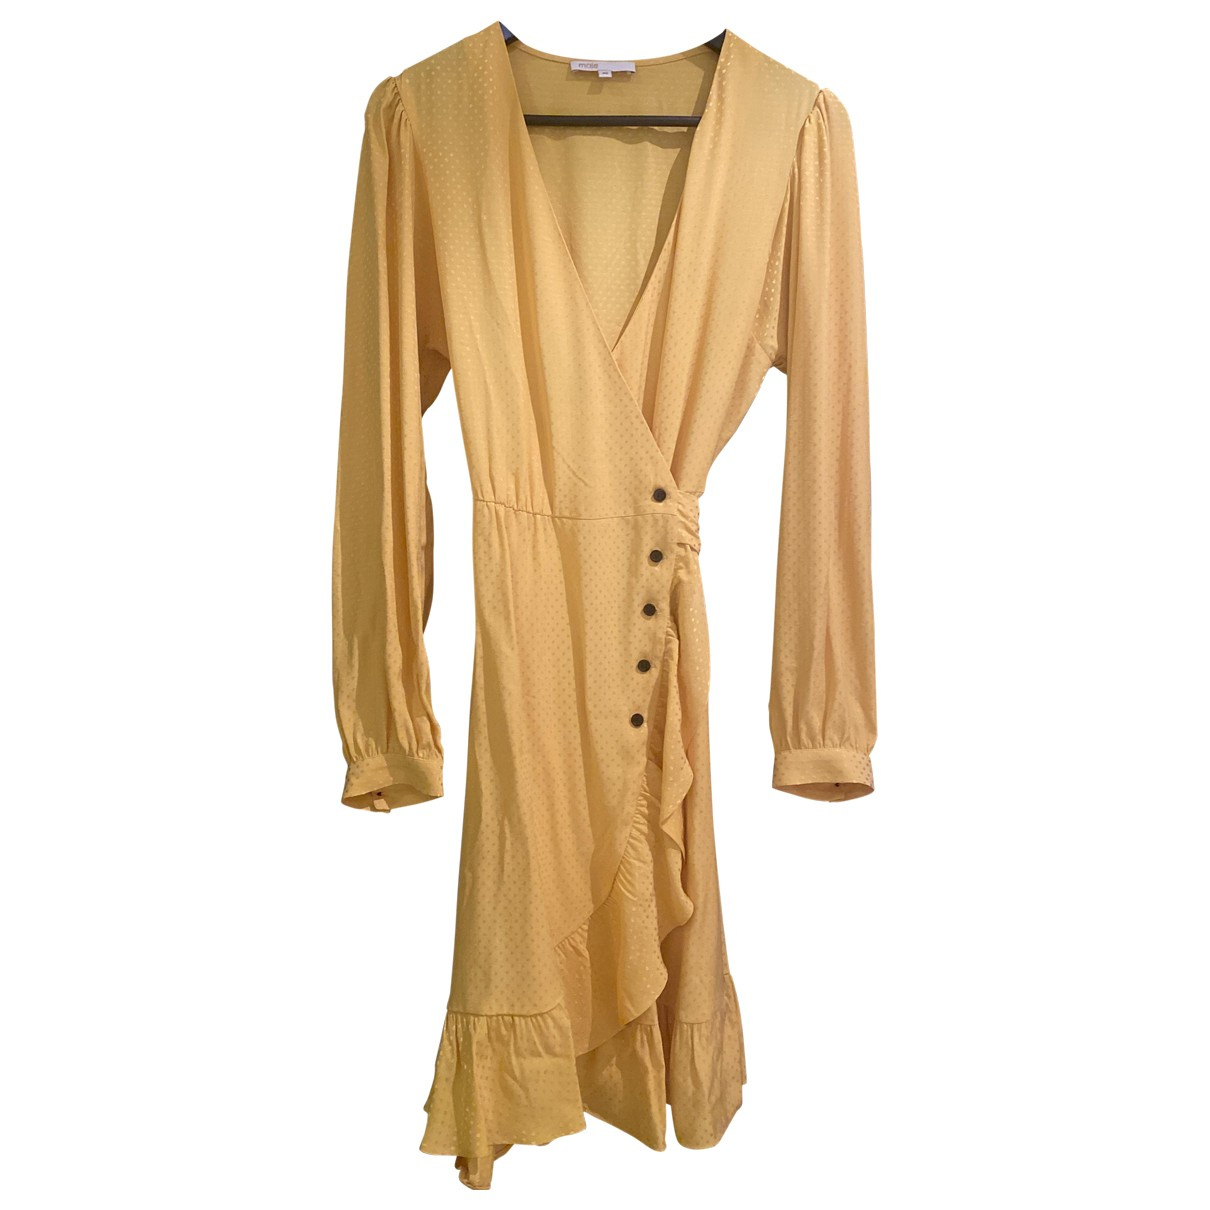 Maje - Robe Spring Summer 2020 pour femme - jaune